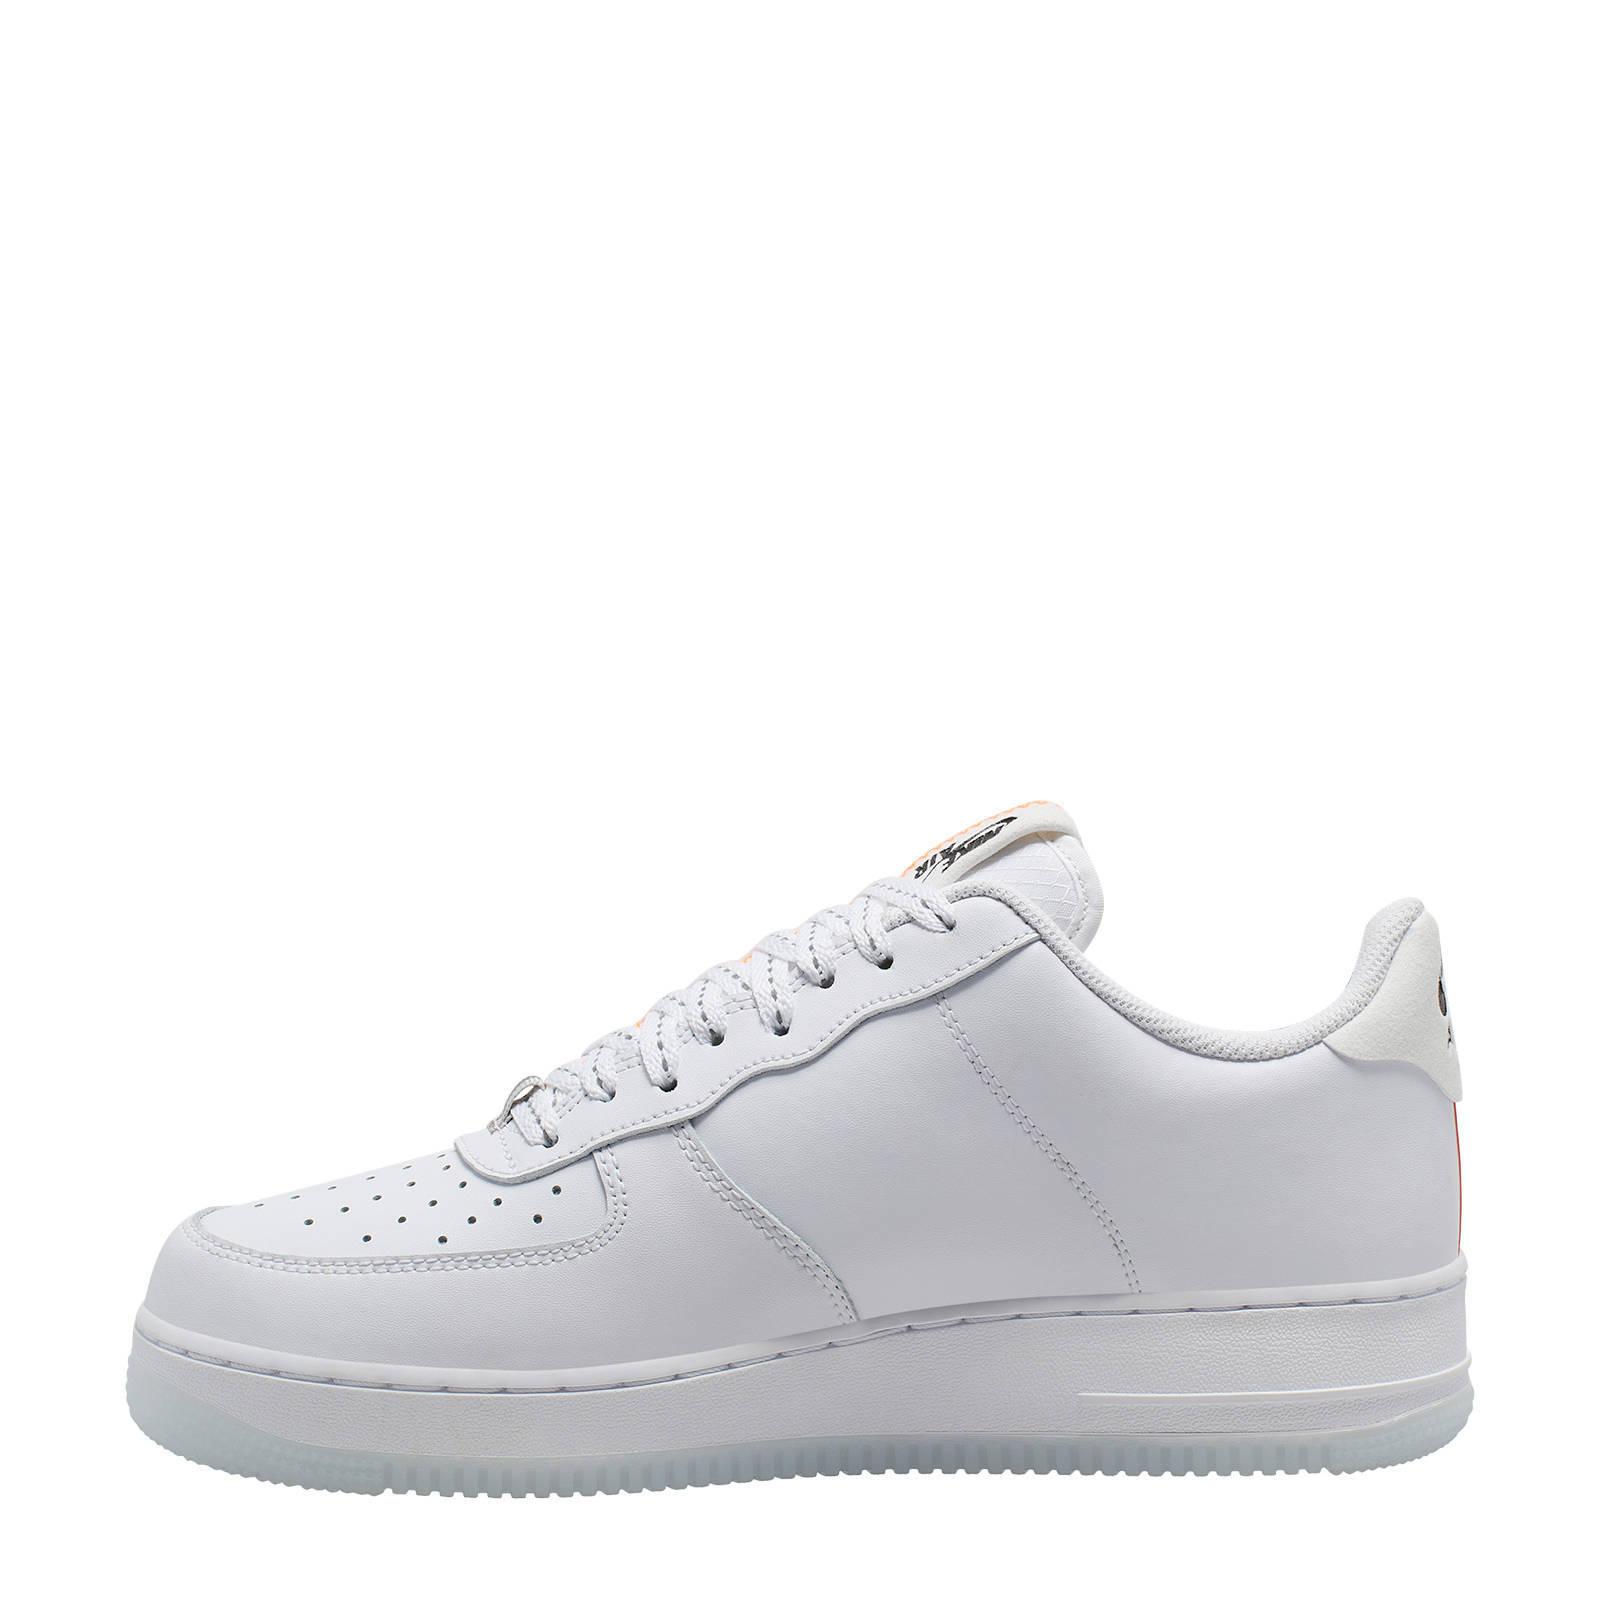 Air Force 1 '07 LV8 3 sneakers witoranje